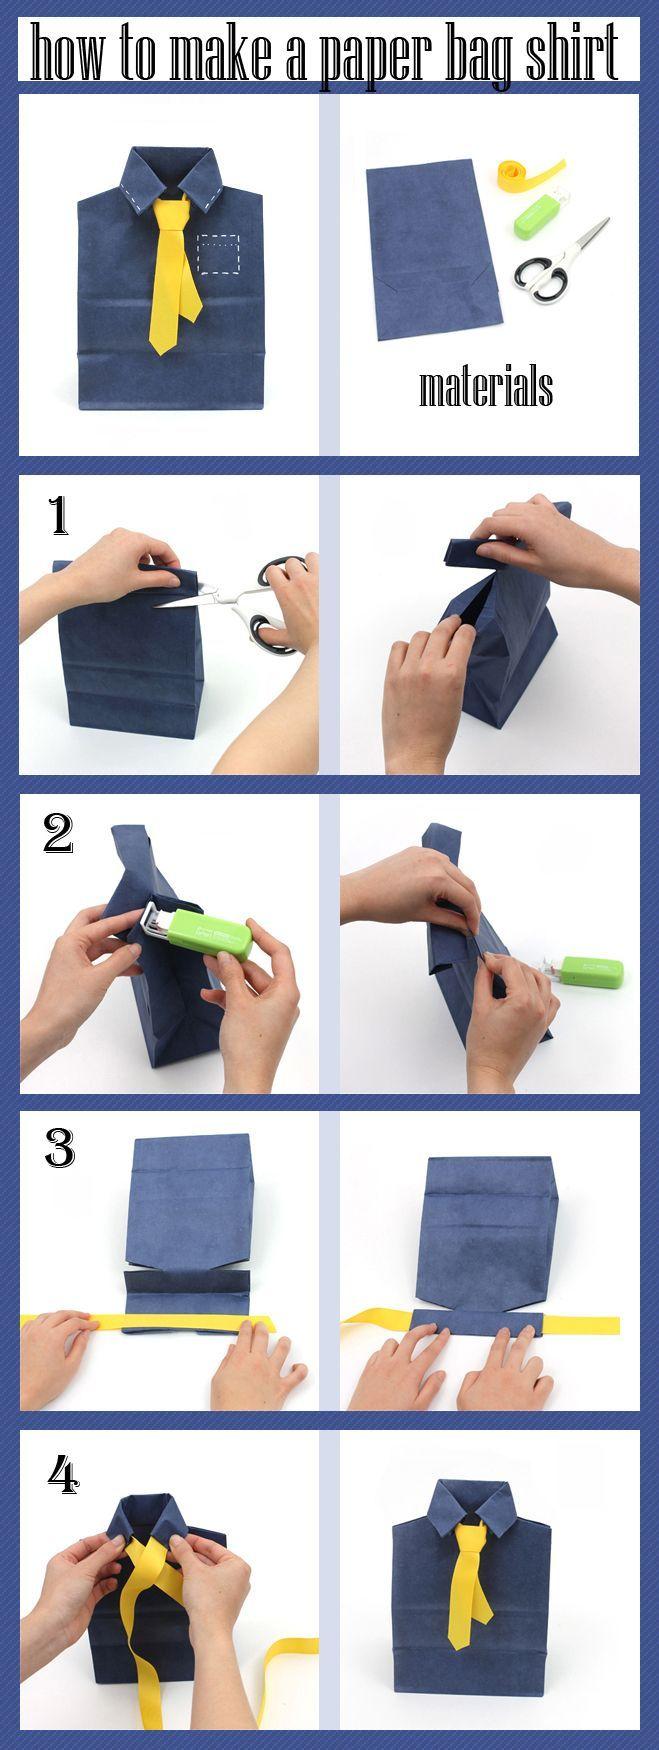 Make a shirt and tie with a paper bag! For detailed instructions, visit jetpens.com/blog. #diy #paperbagcraft